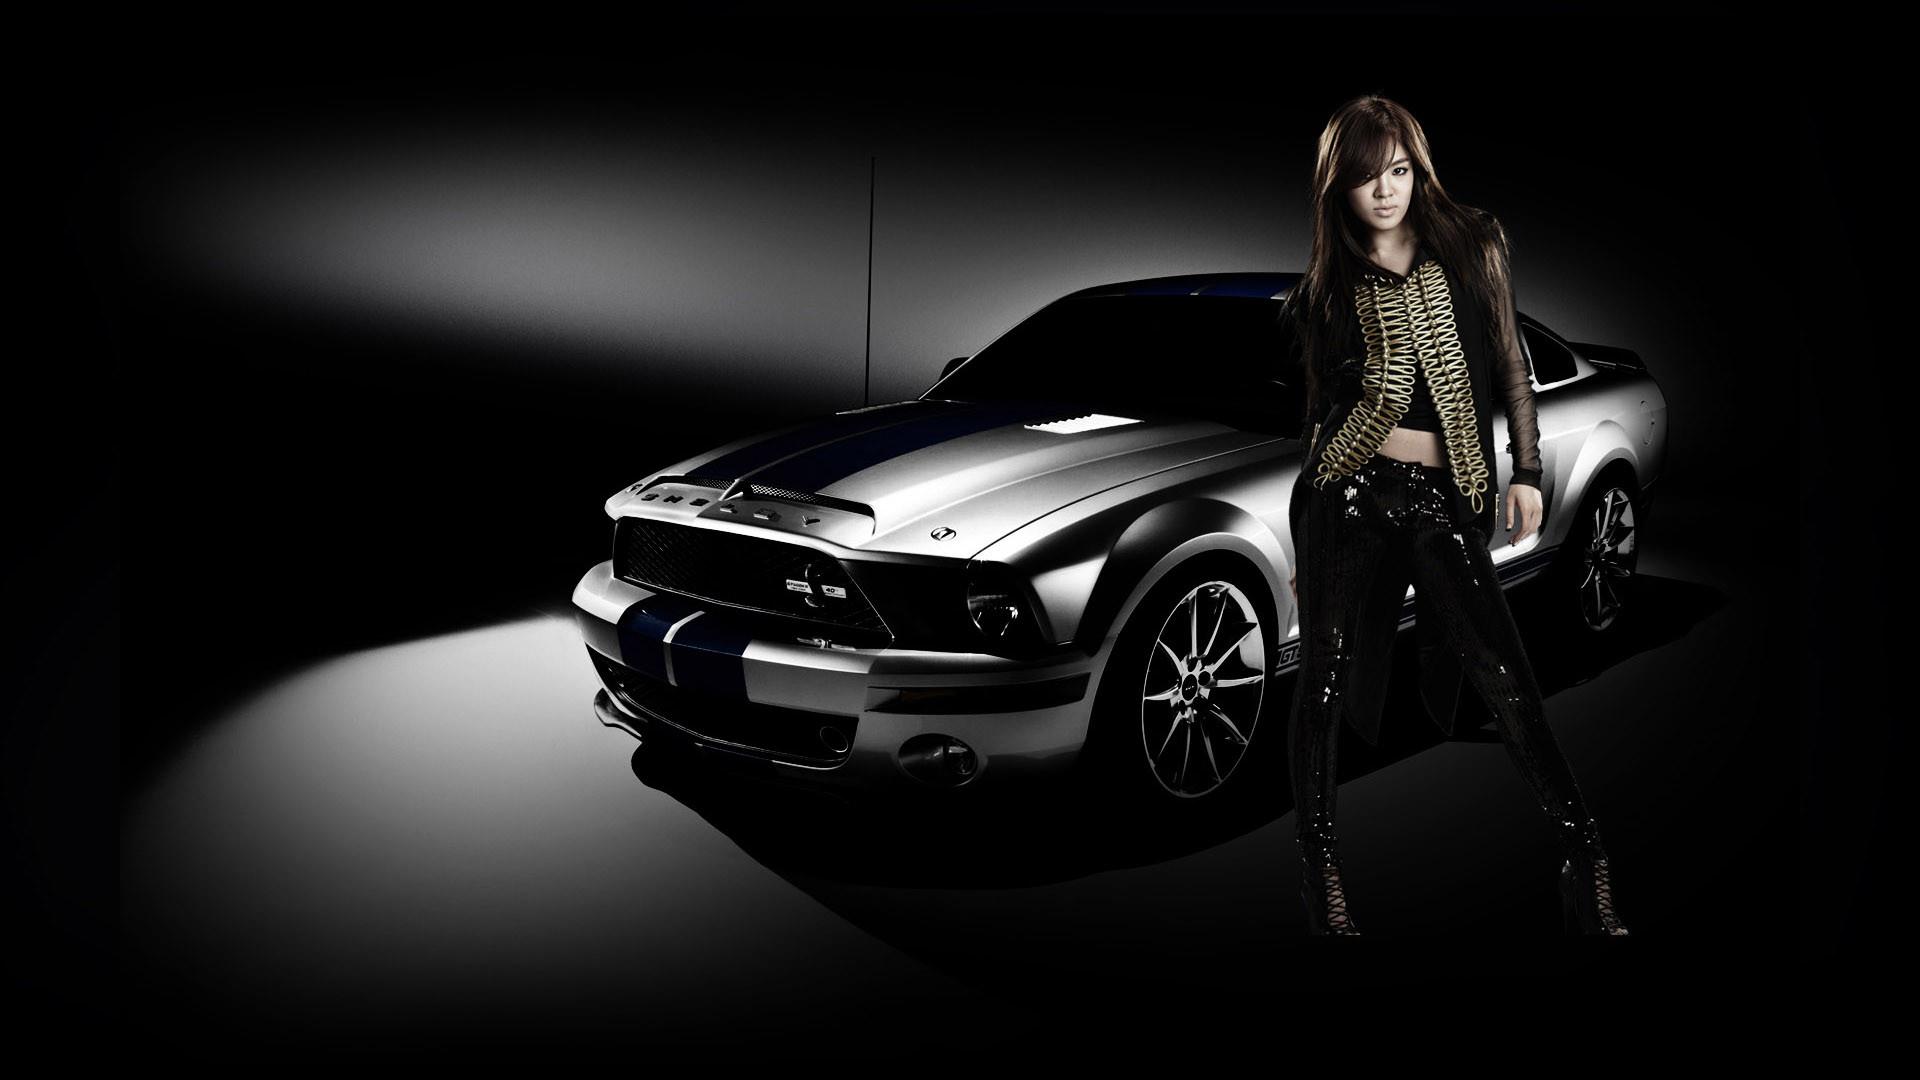 Car And Black Dress Girl Wallpaper